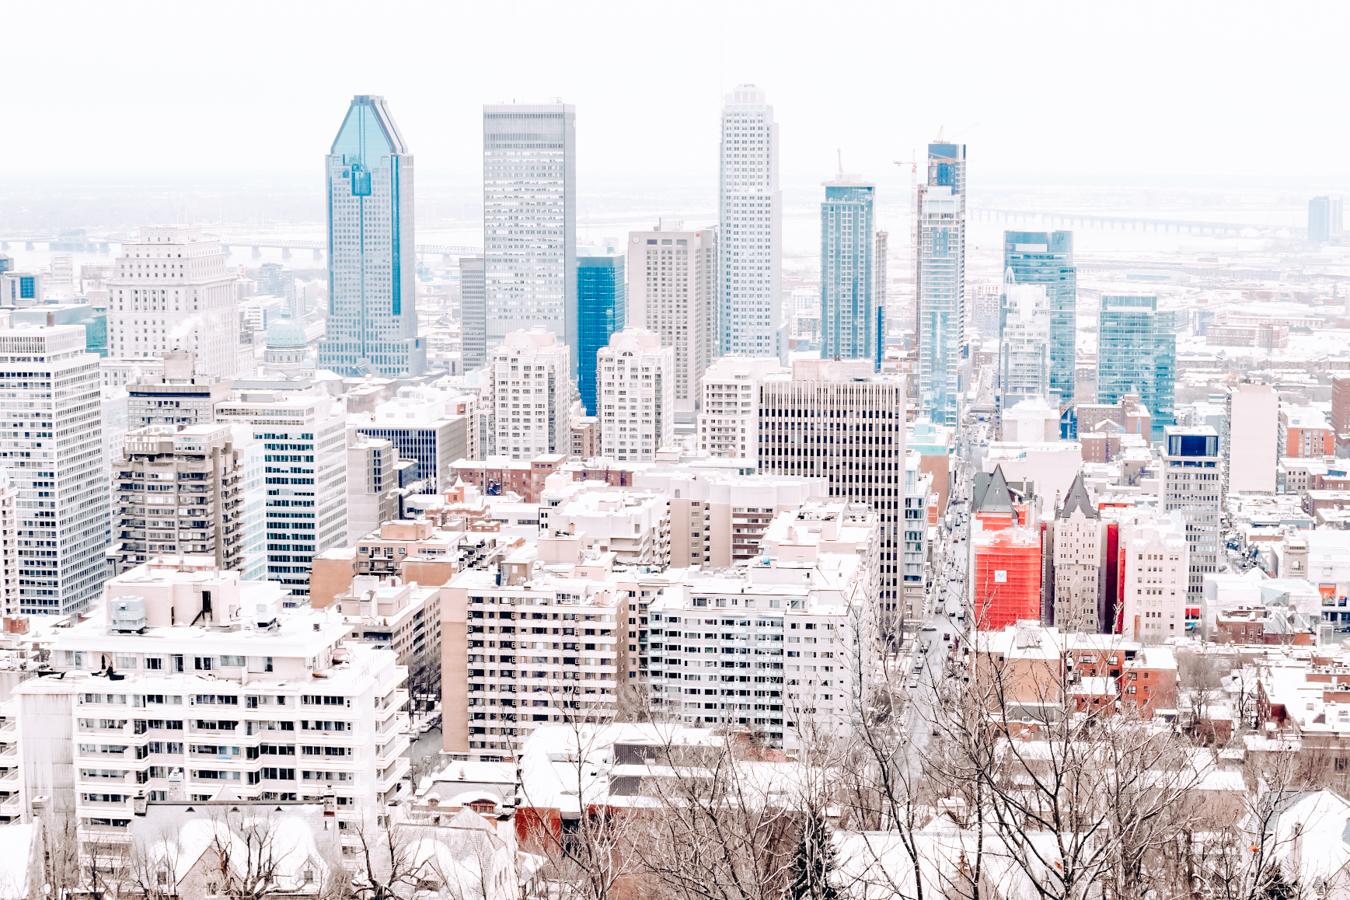 Buildings in Montreal